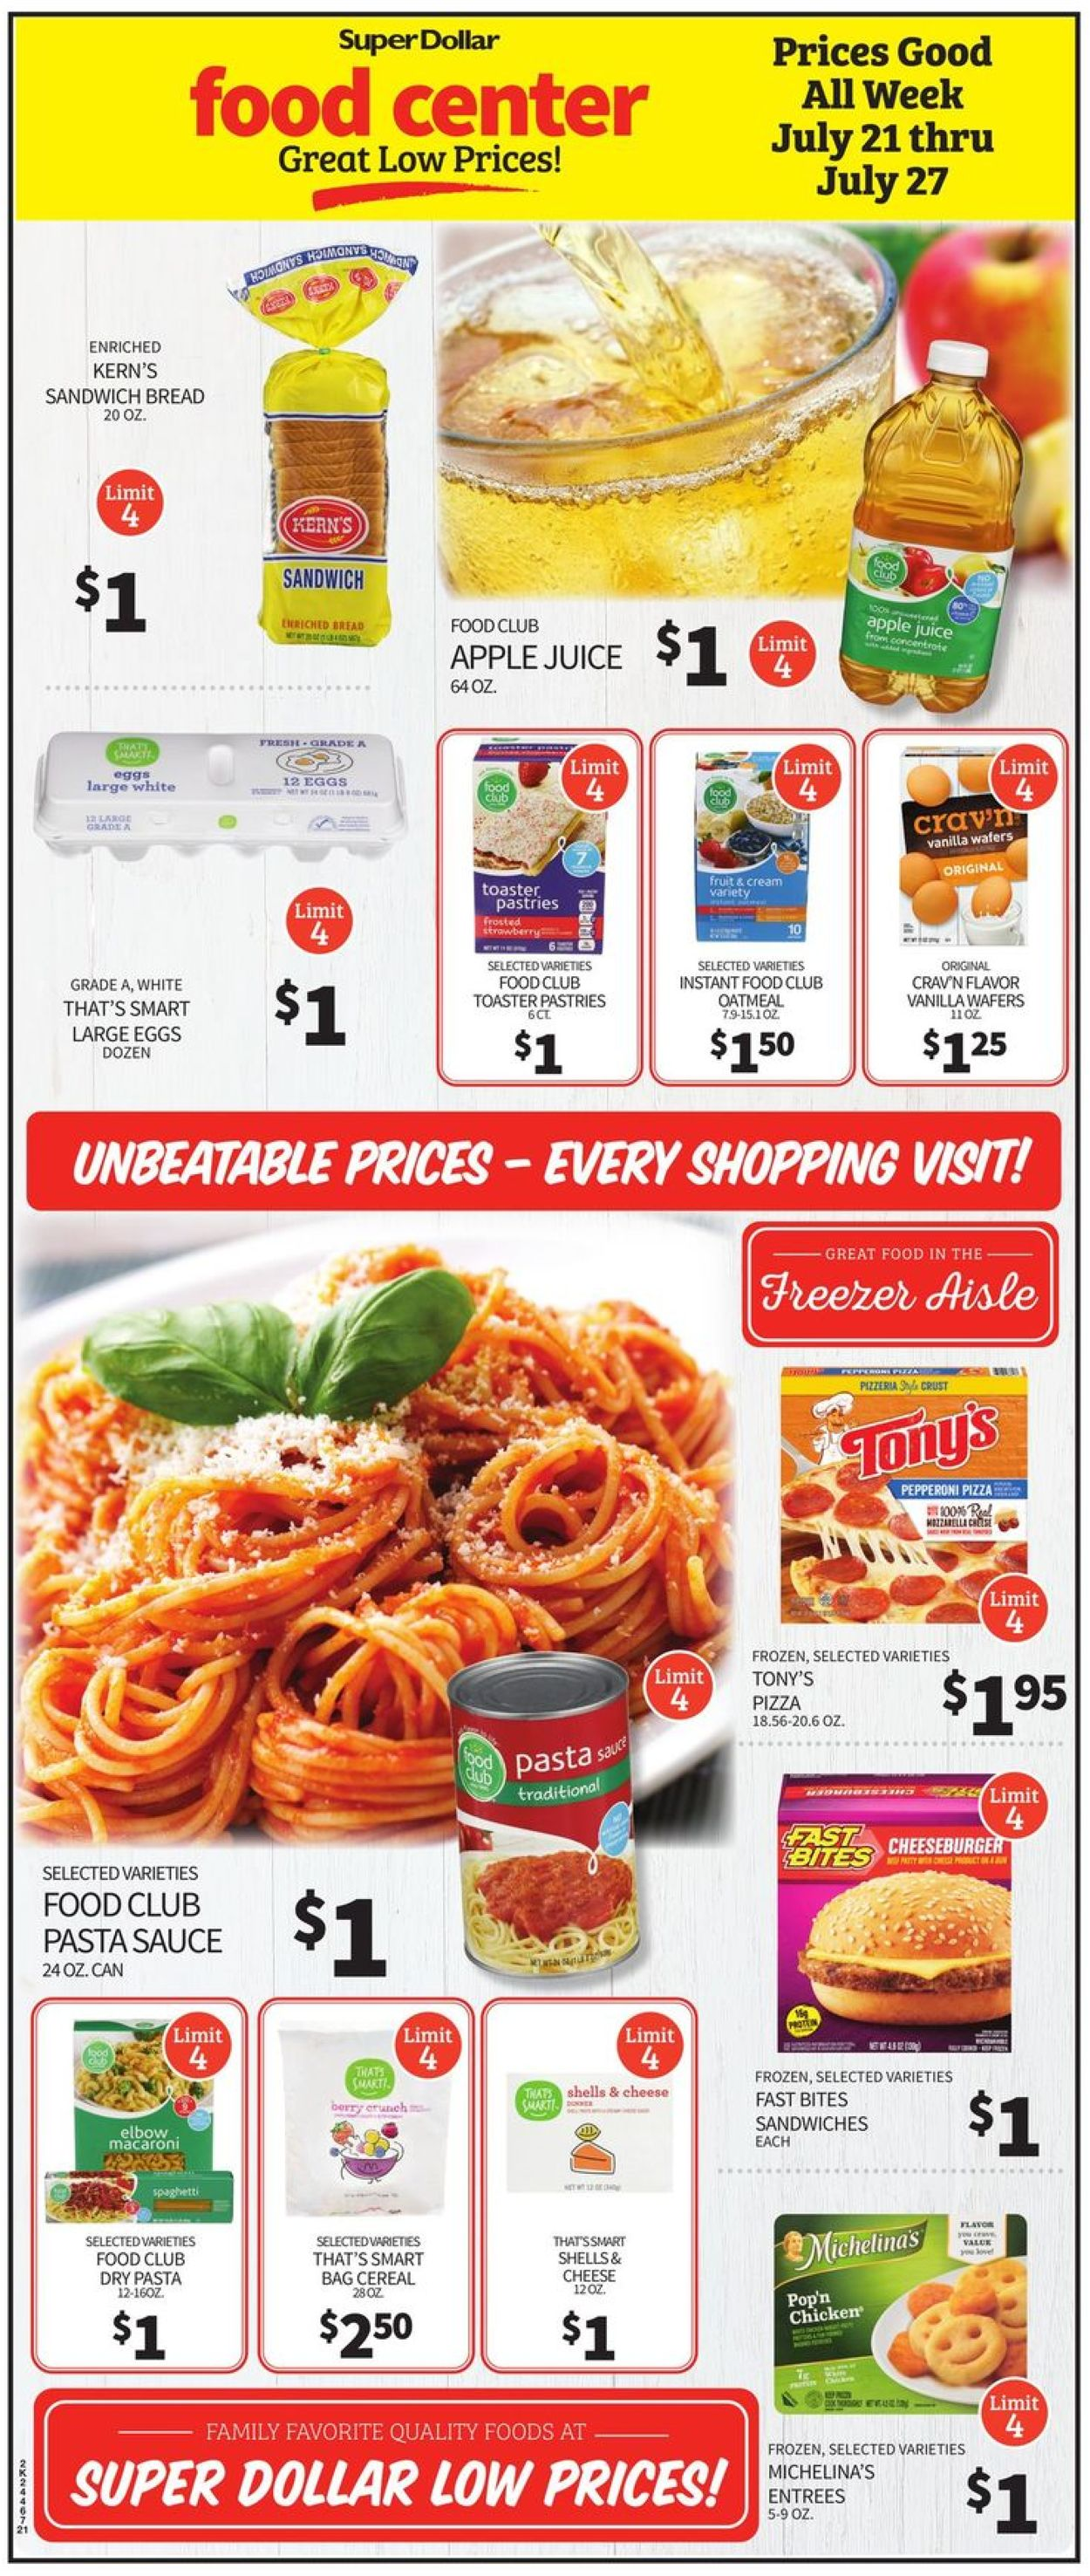 Super Dollar Food Center Weekly Ad Circular - valid 07/21-07/27/2021 (Page 2)